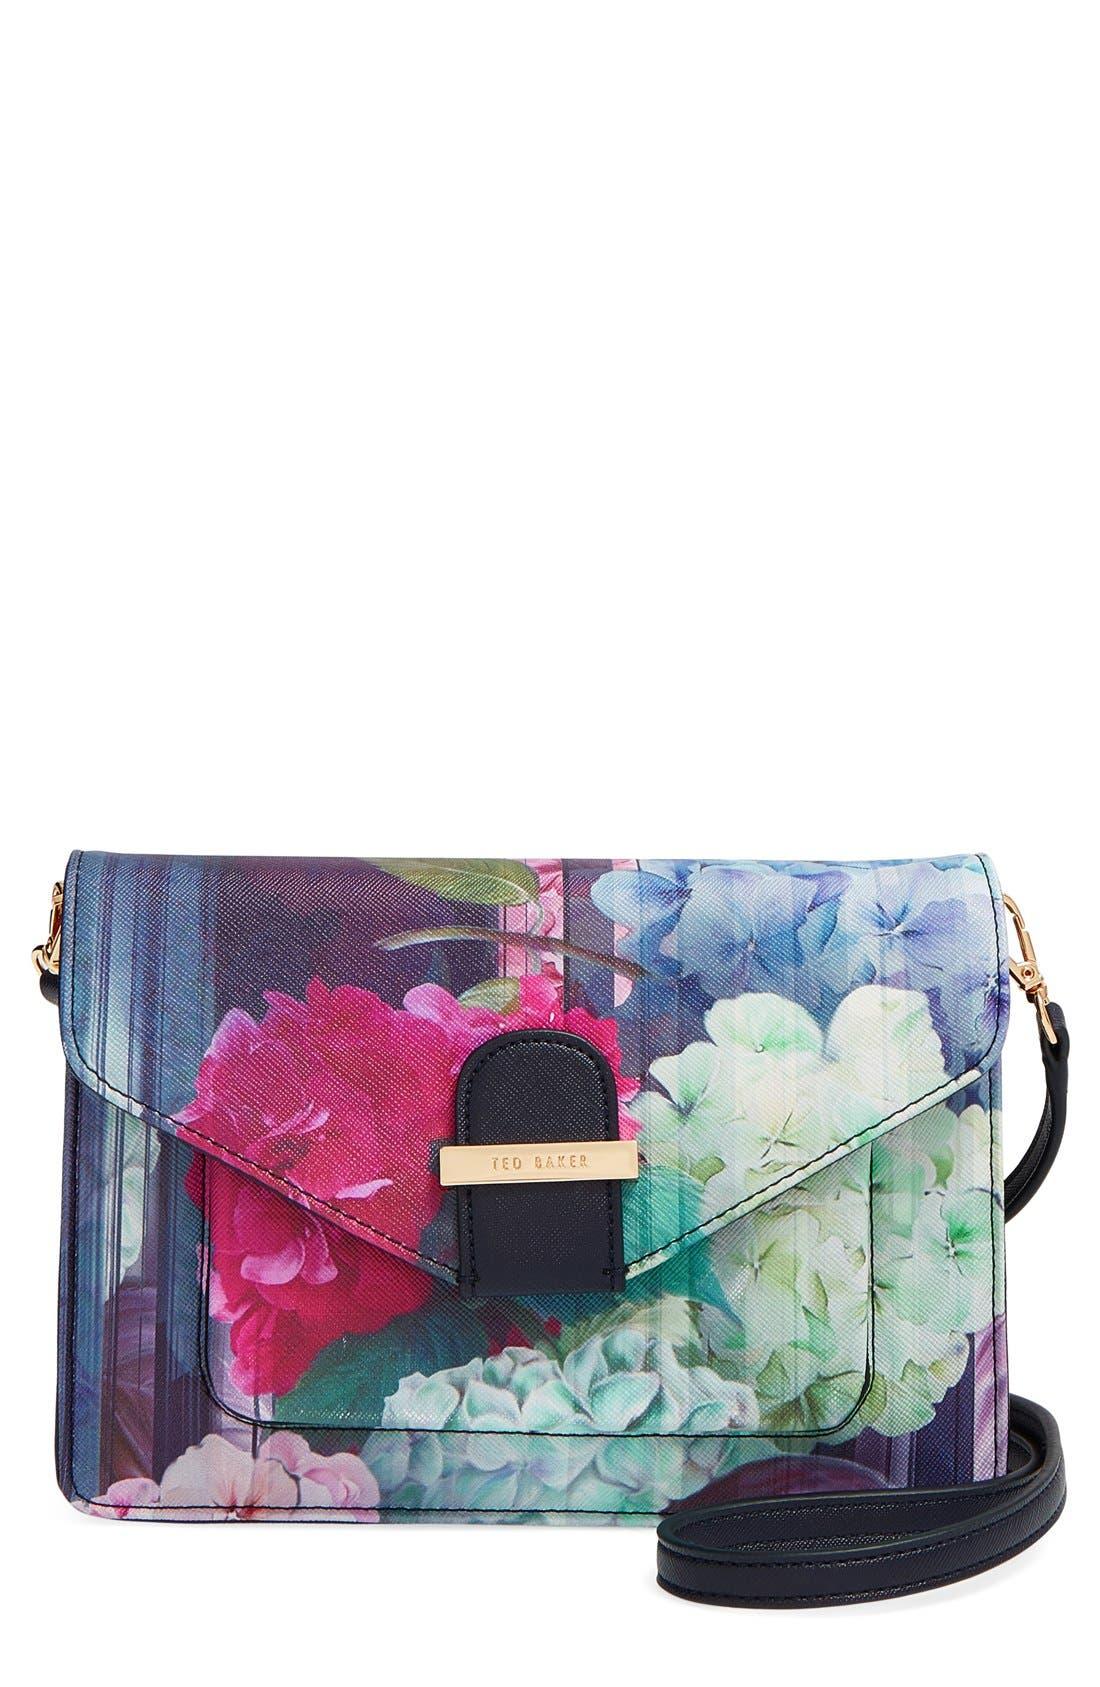 Alternate Image 1 Selected - Ted Baker London 'Hydrangea' Floral Print Crossbody Bag